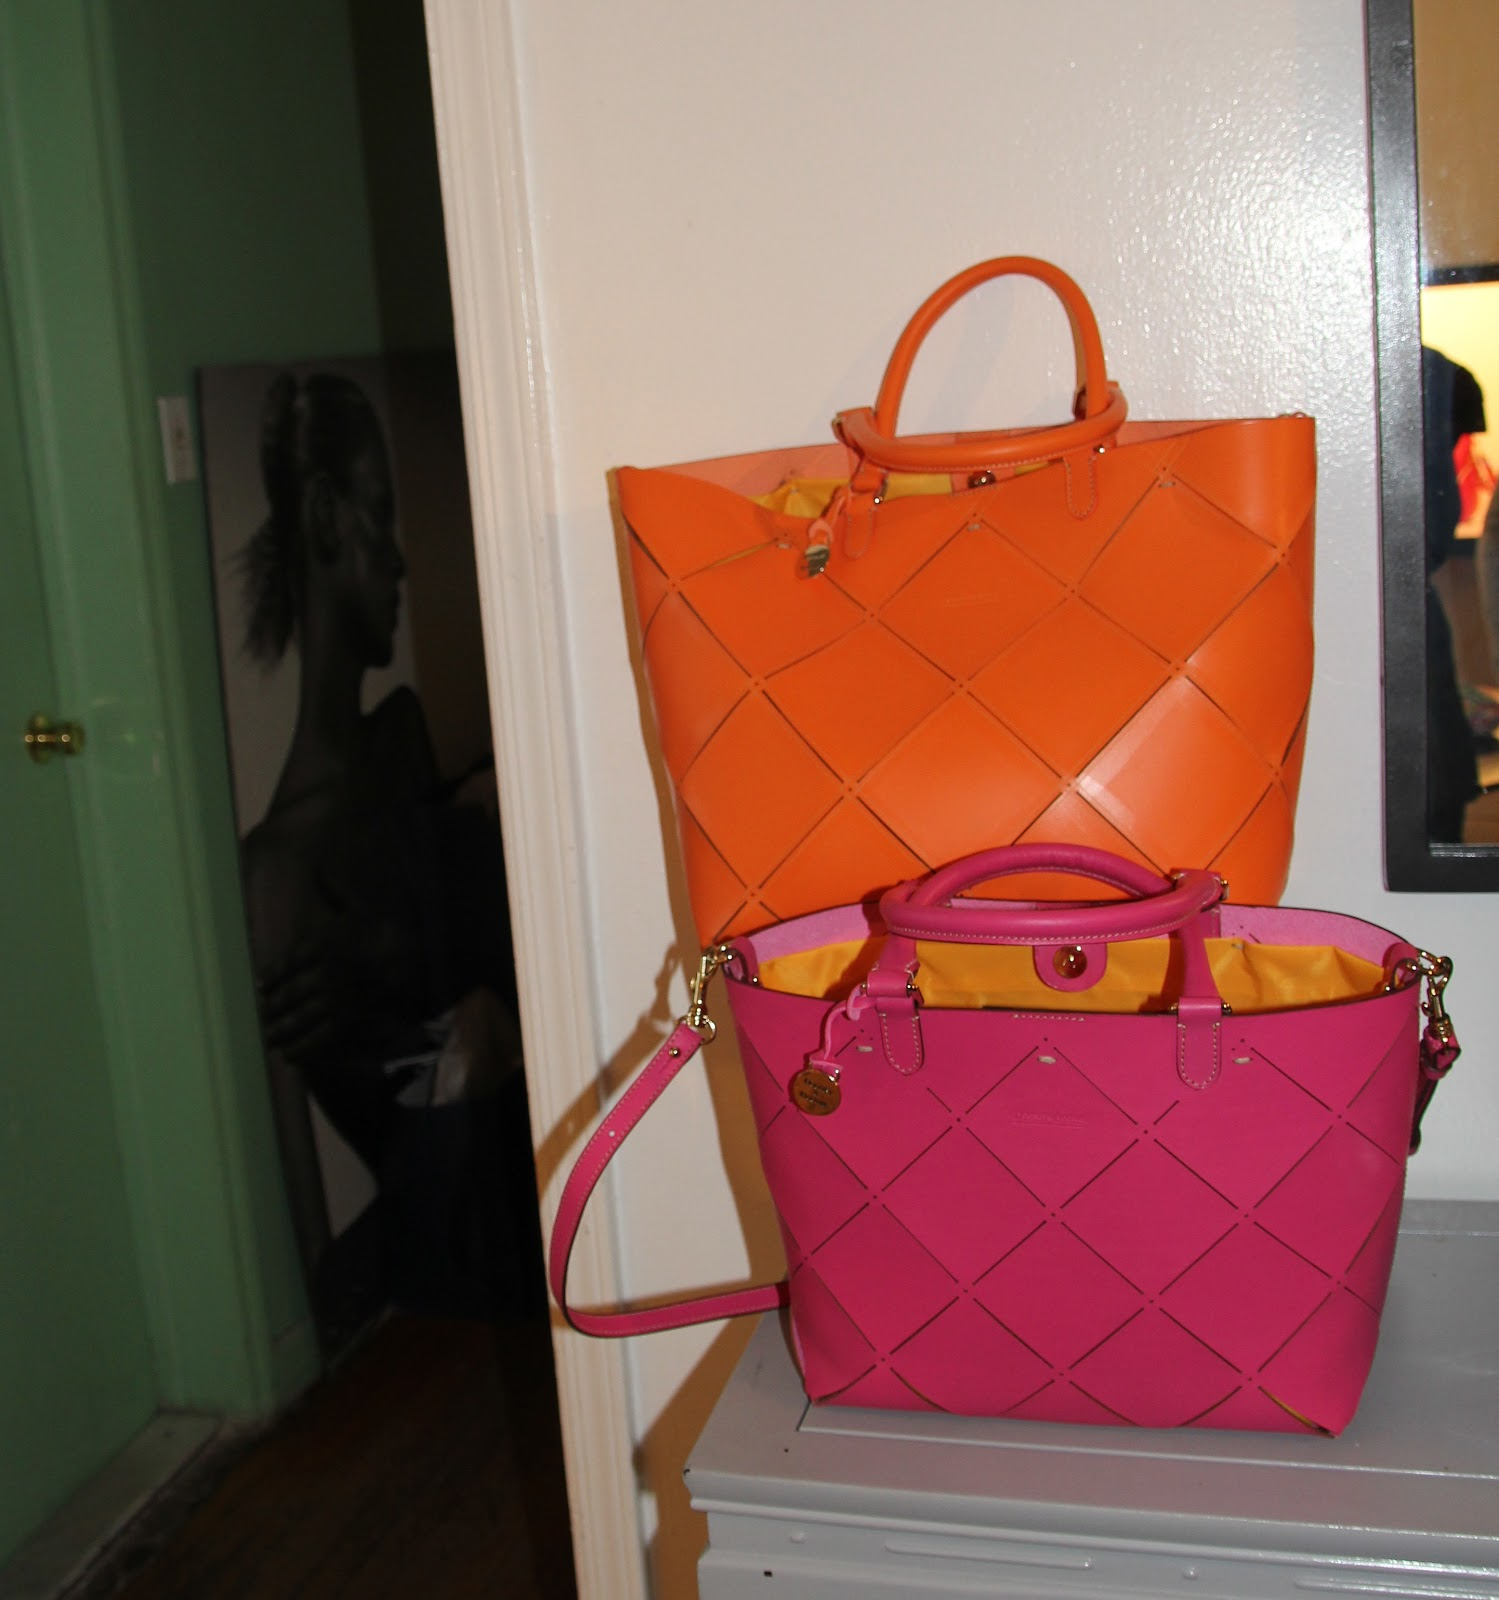 56af1ab4254 DOONEY + BOURKE SPRING 2013 Handbags, Totes, Accessories